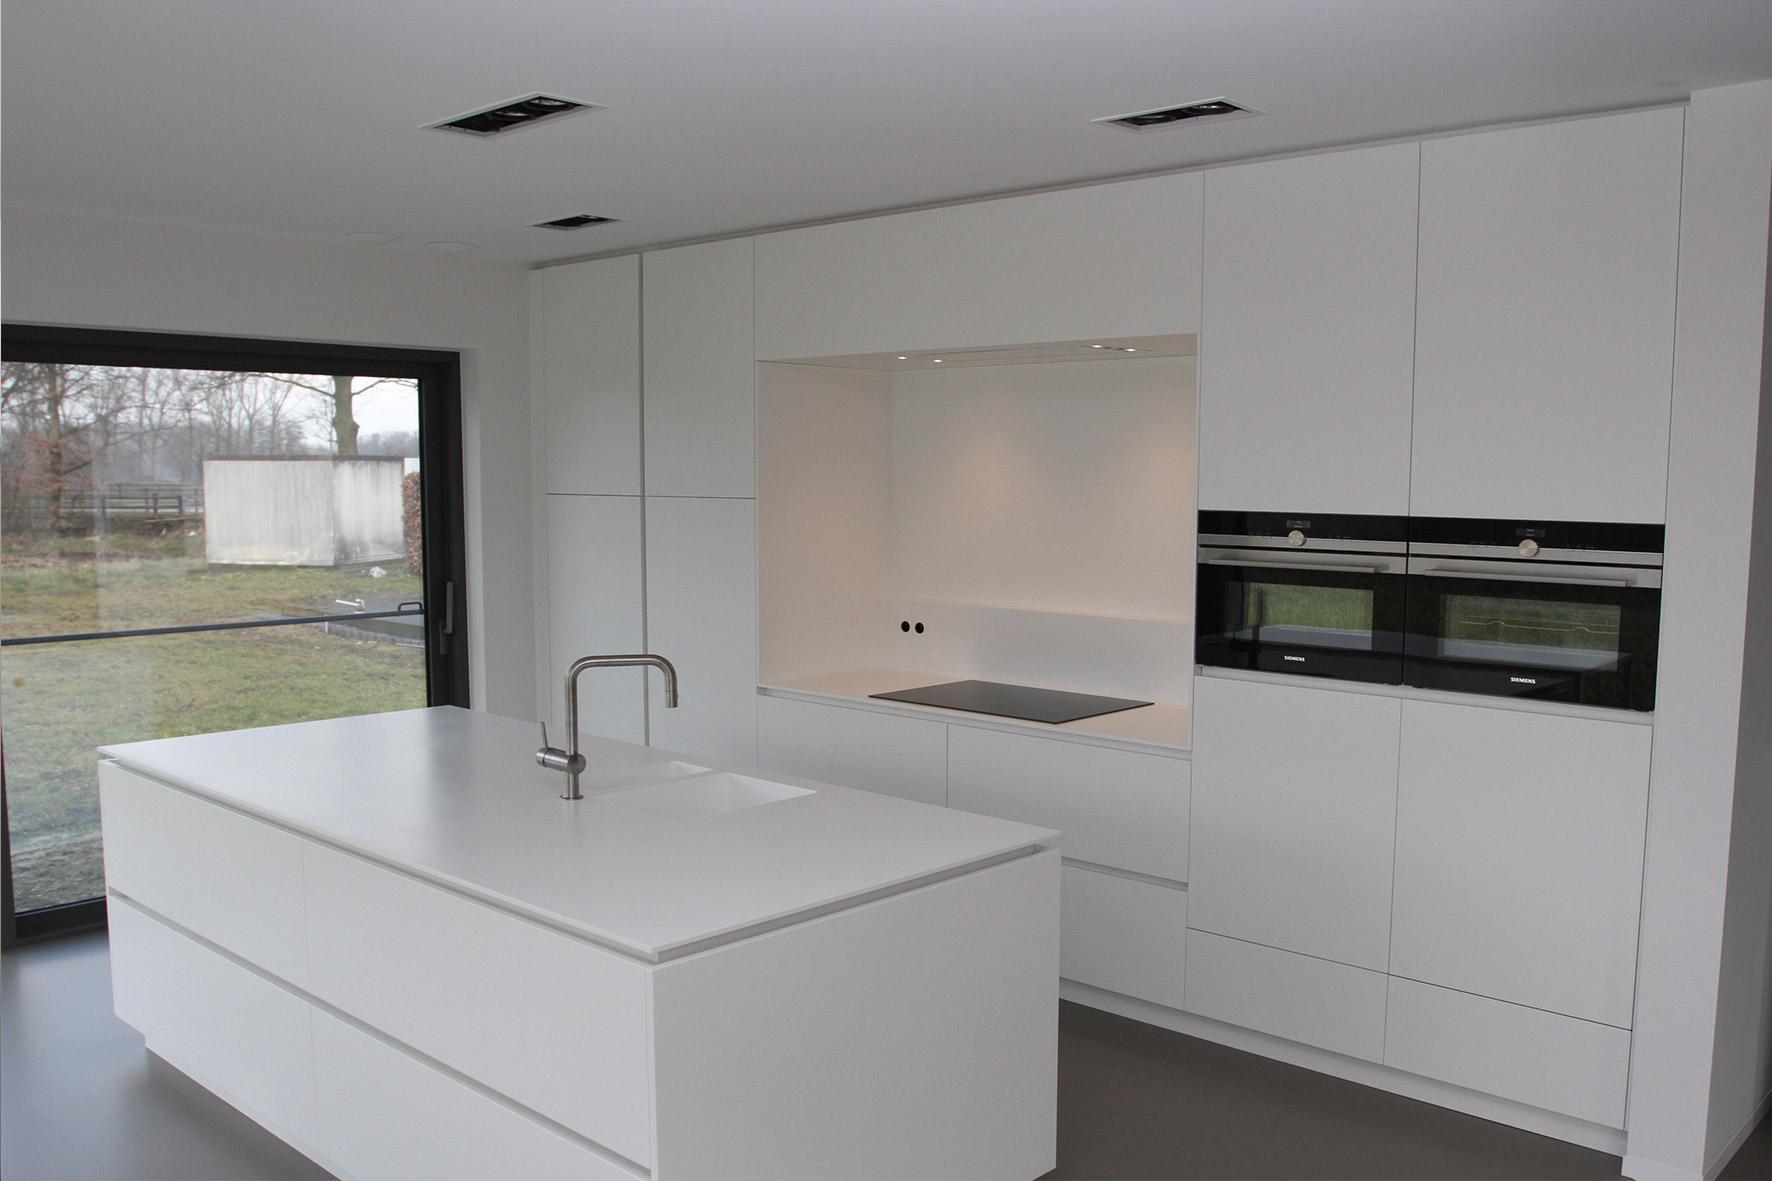 Keuken greeploos wit - Keuken blauw en wit ...